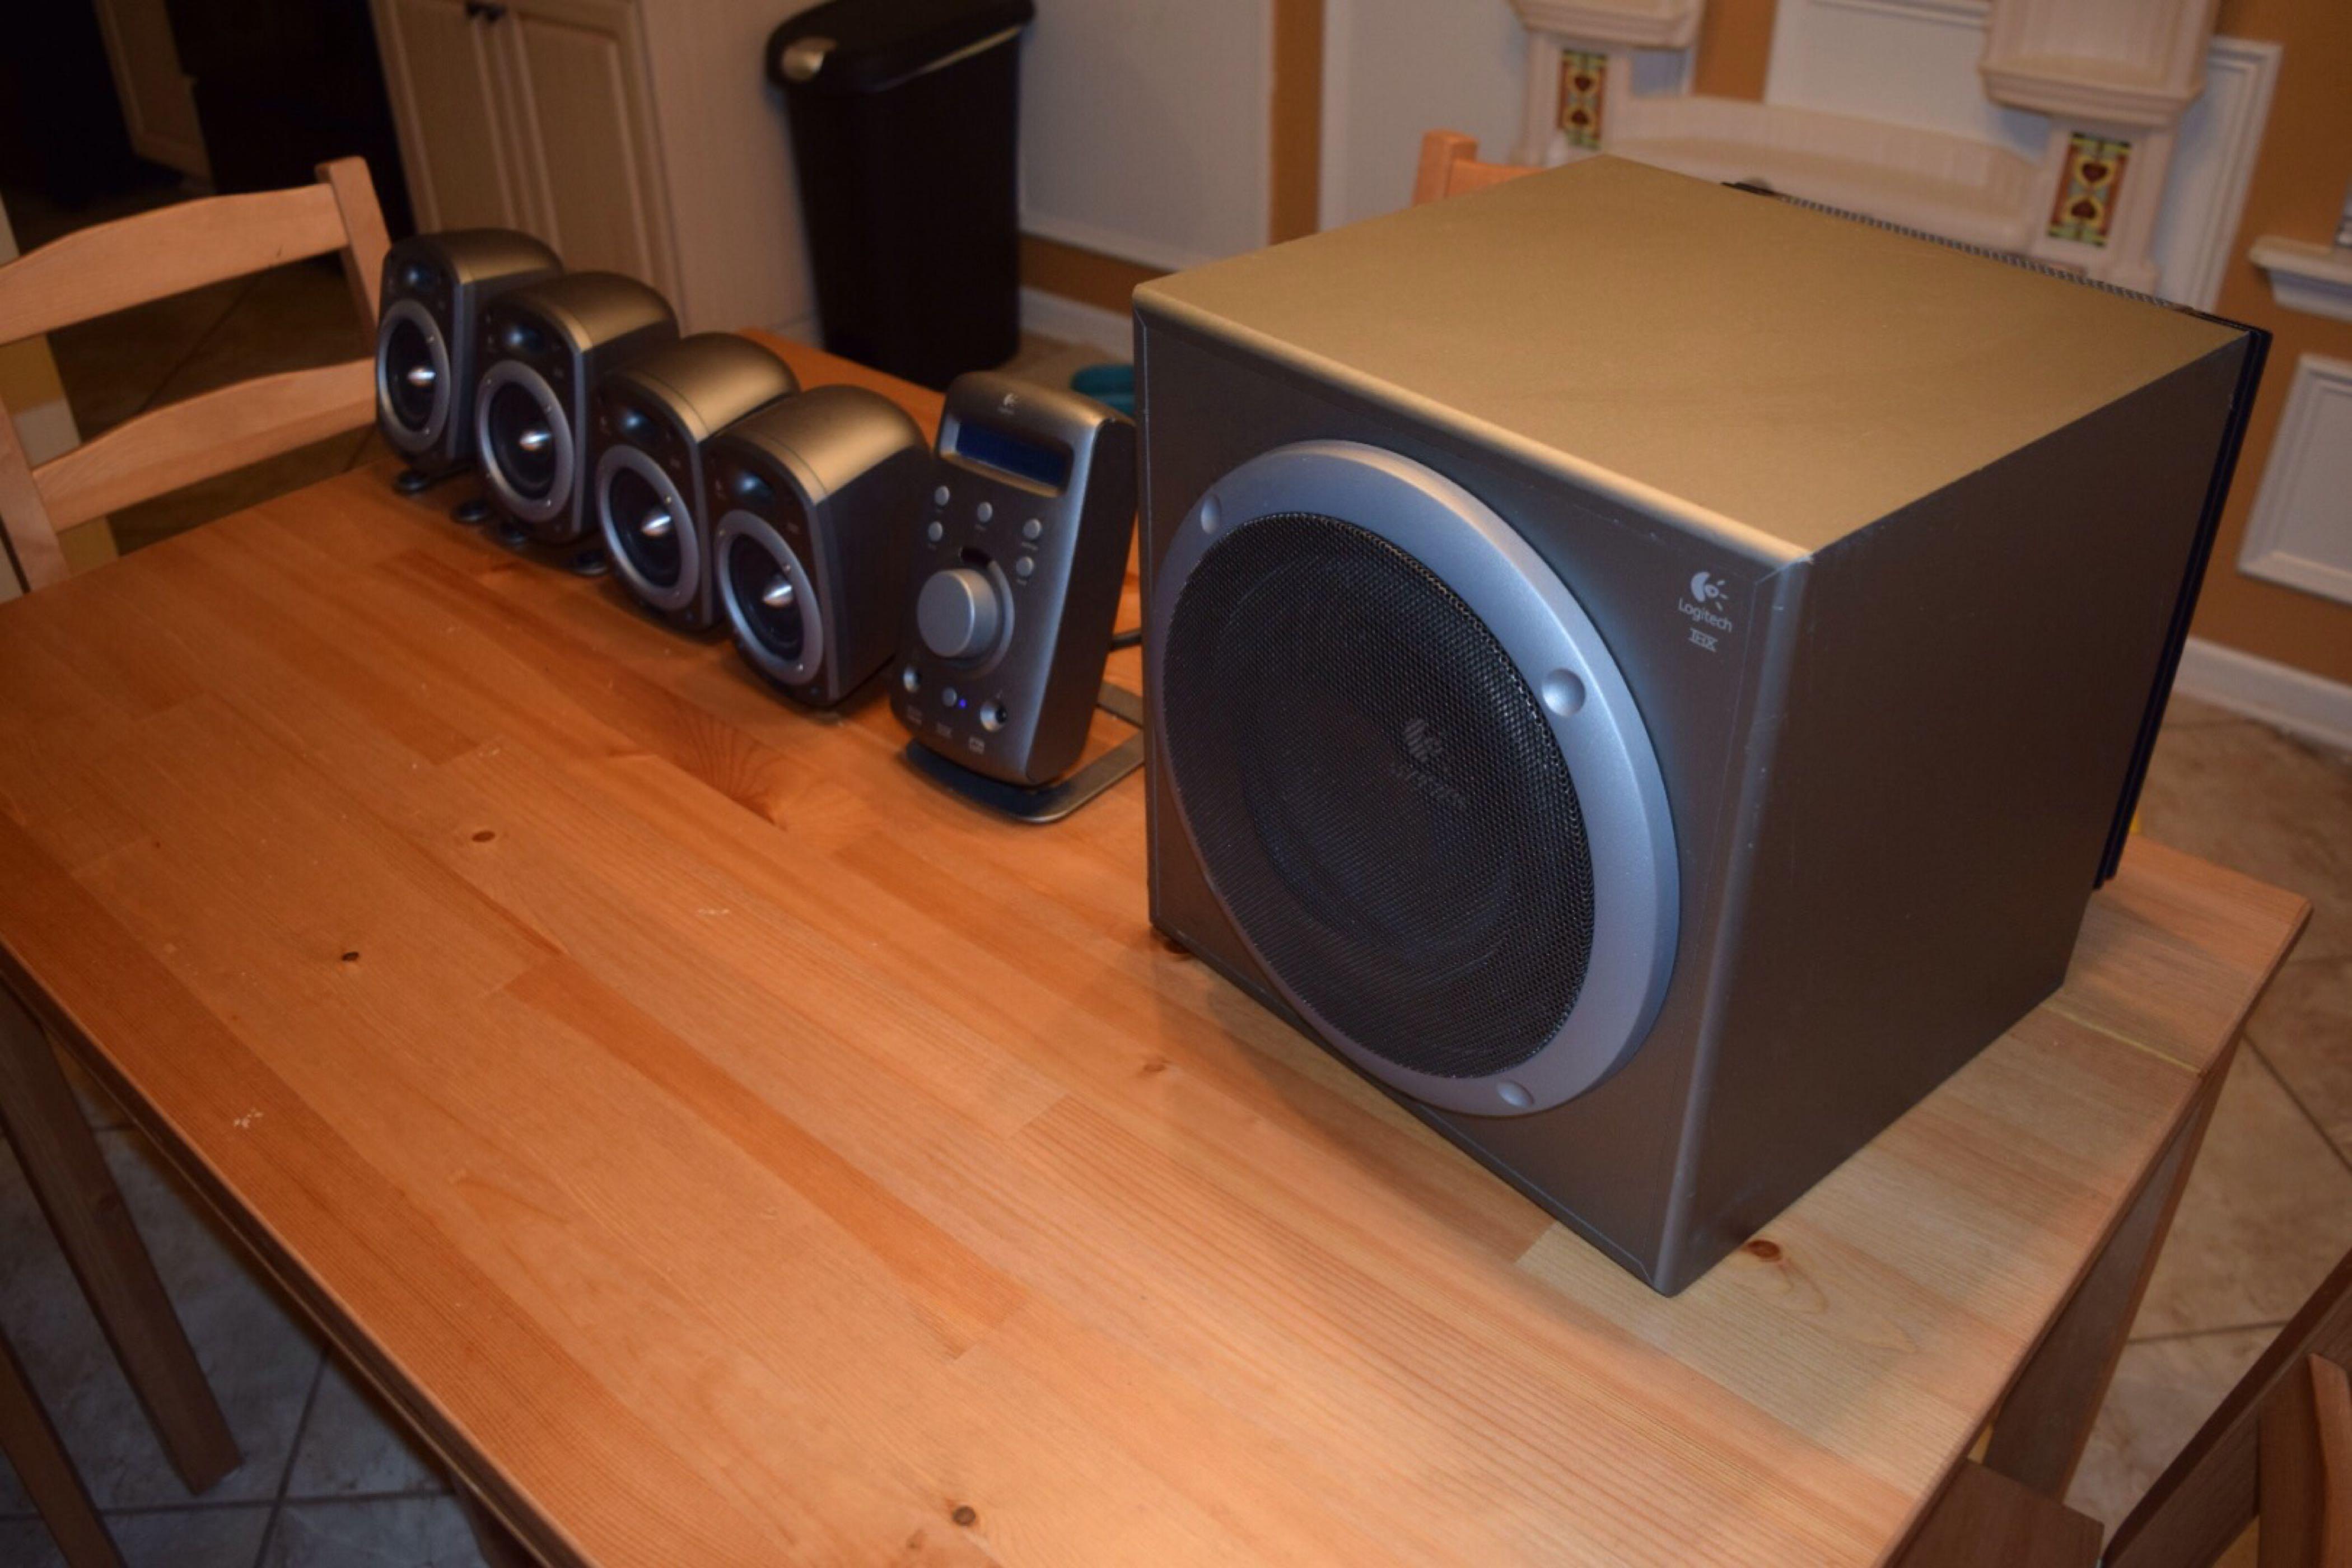 Ongebruikt Best Logitech Z-680 Speakers for sale in Appling, Georgia for 2019 GT-48